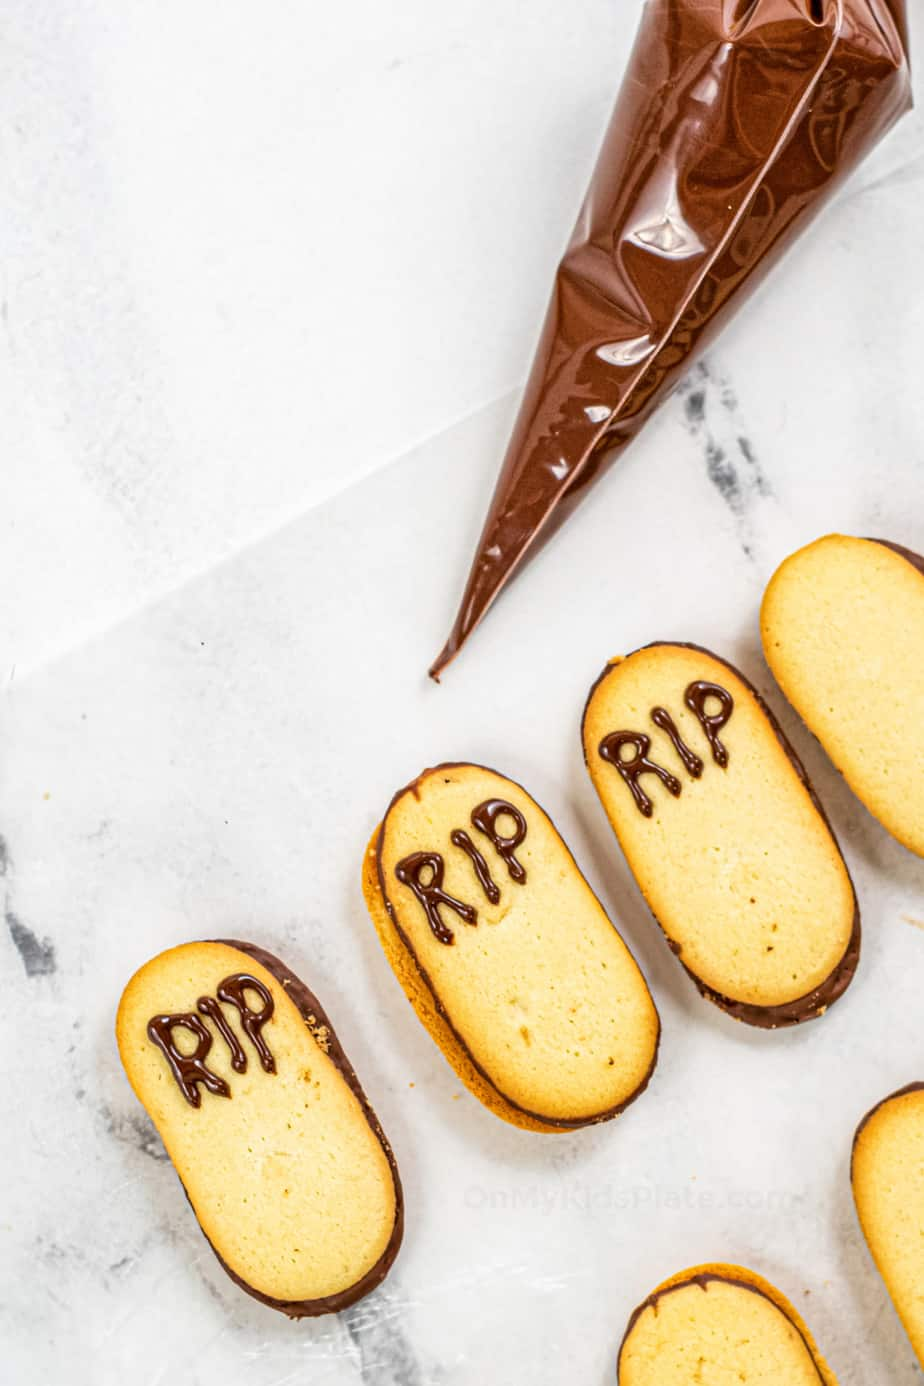 Decorating Milano cookies writing RIP in chocolate to make gravestones.